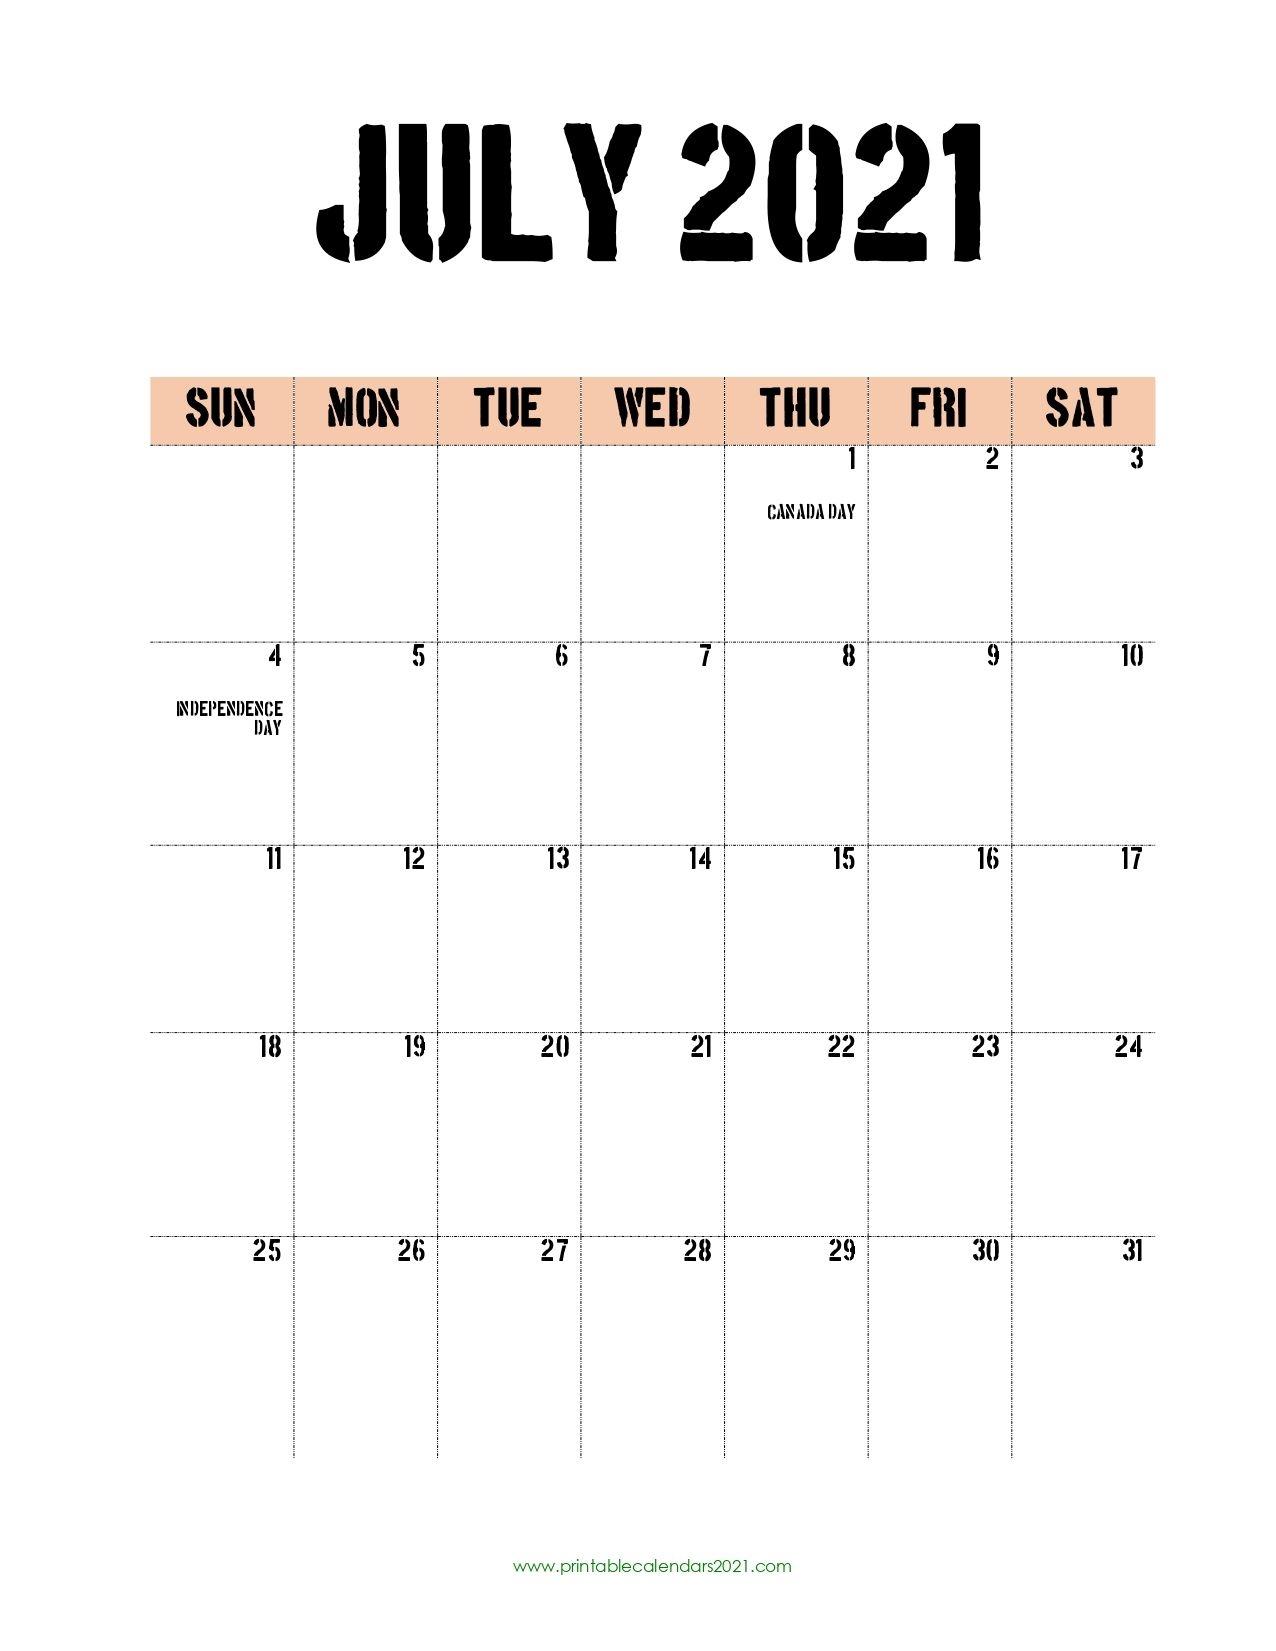 45 july 2021 calendar printable, july 2021 calendar pdf